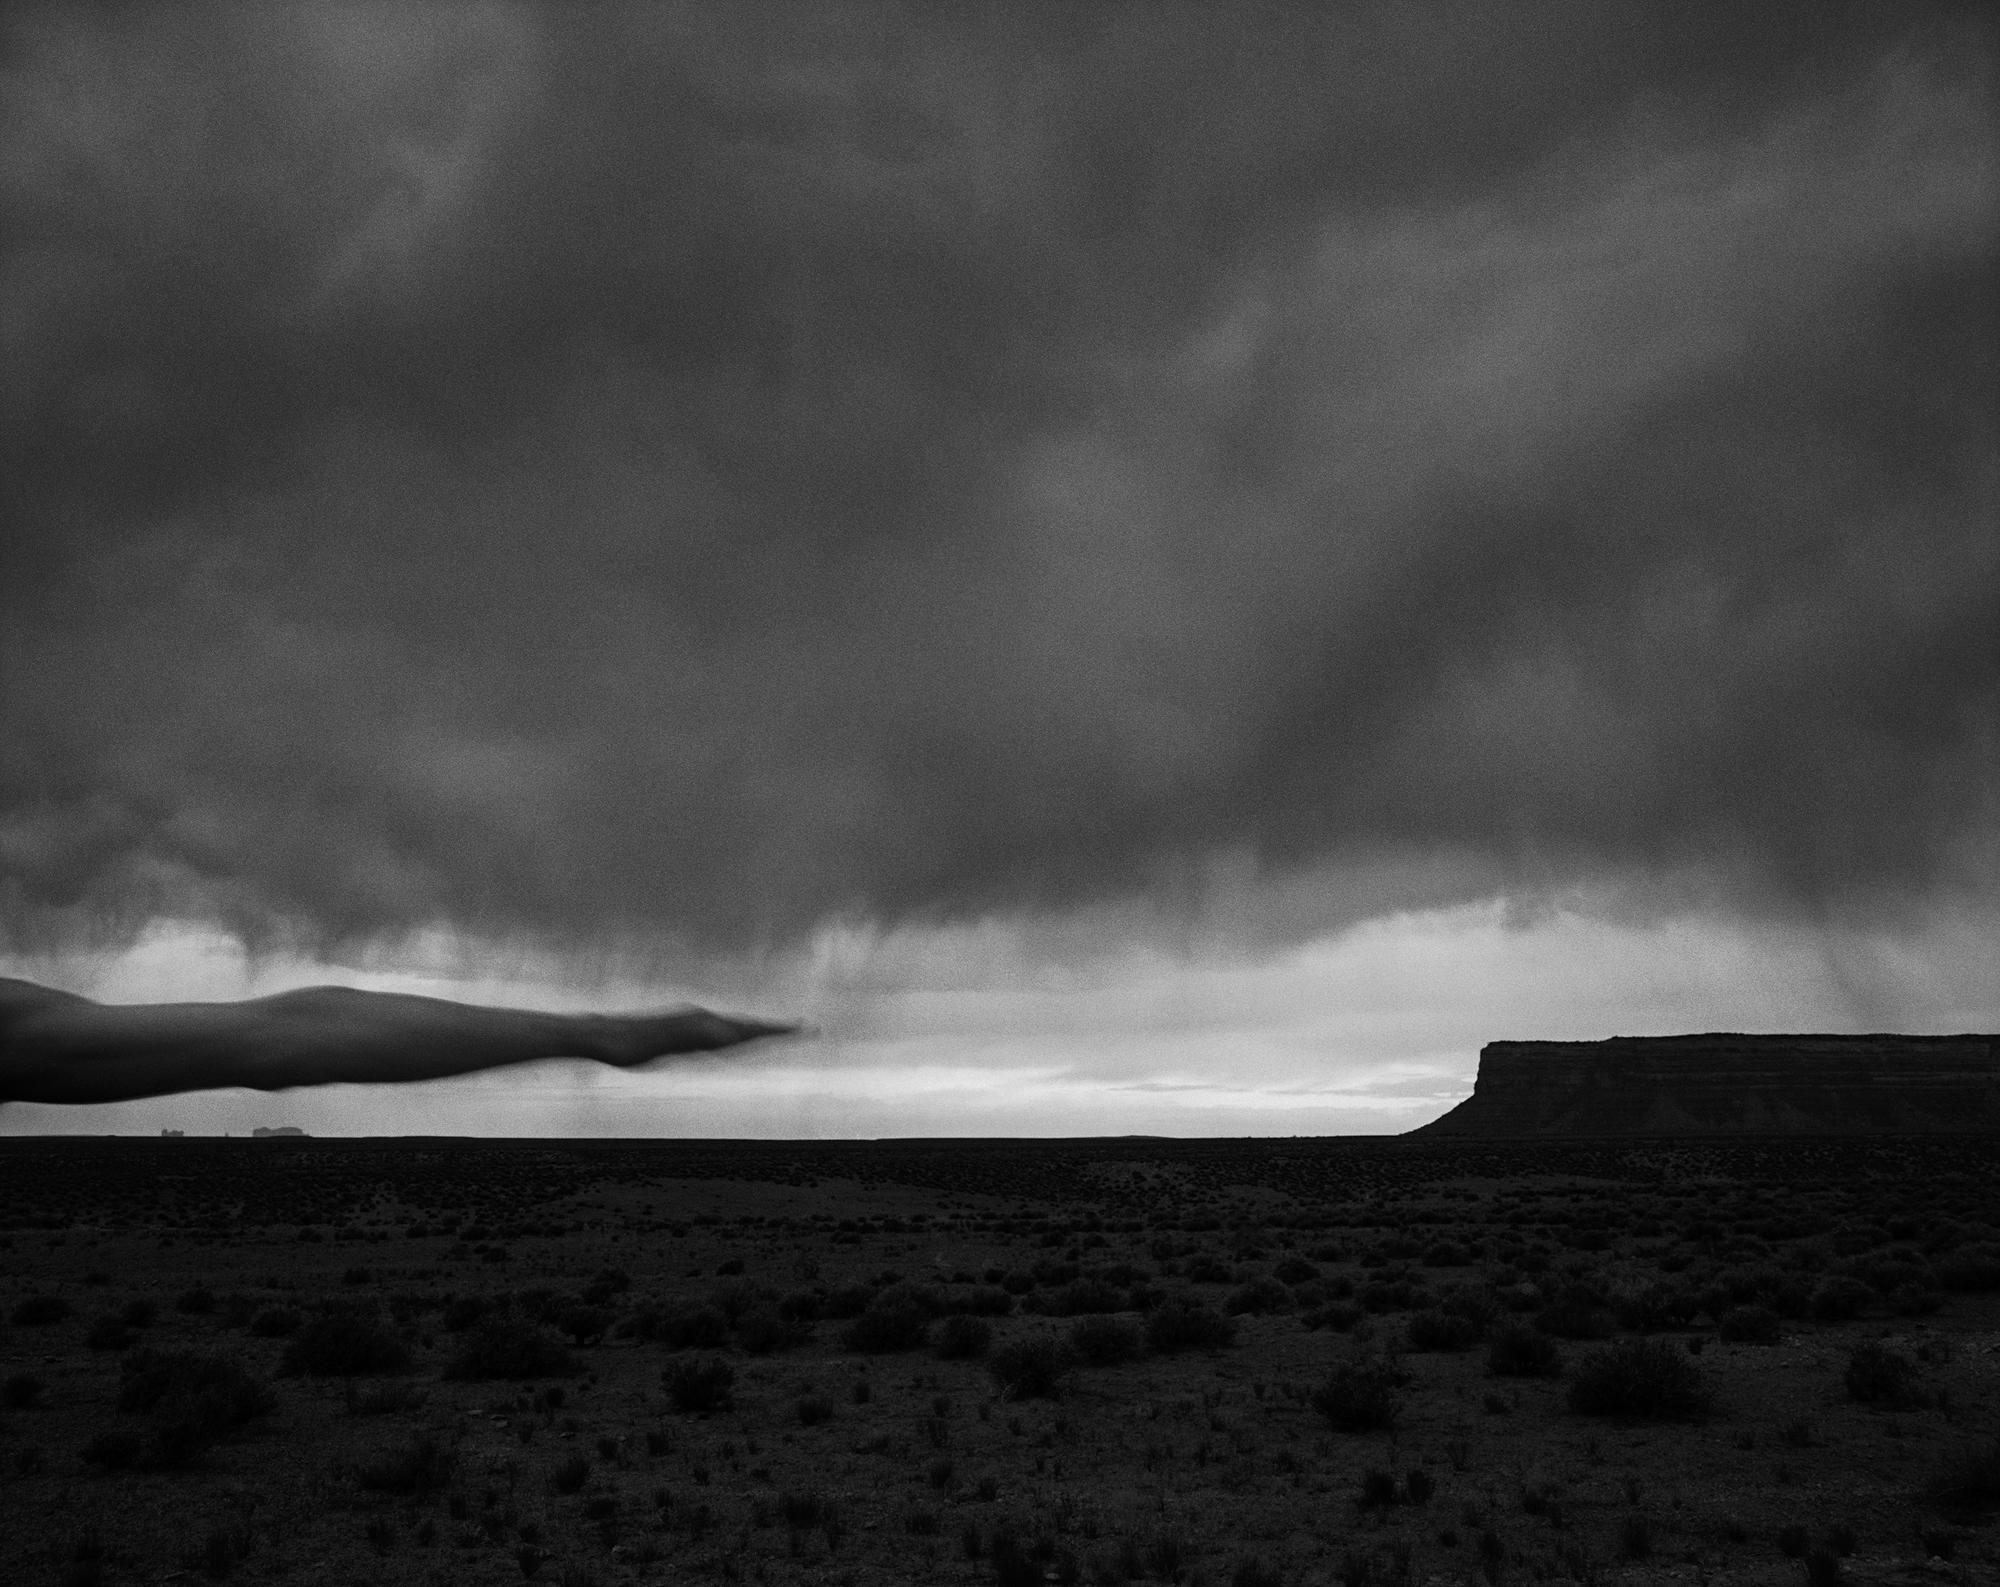 Arno Rafael Minkkinen - Muley Point, Arizona 1999